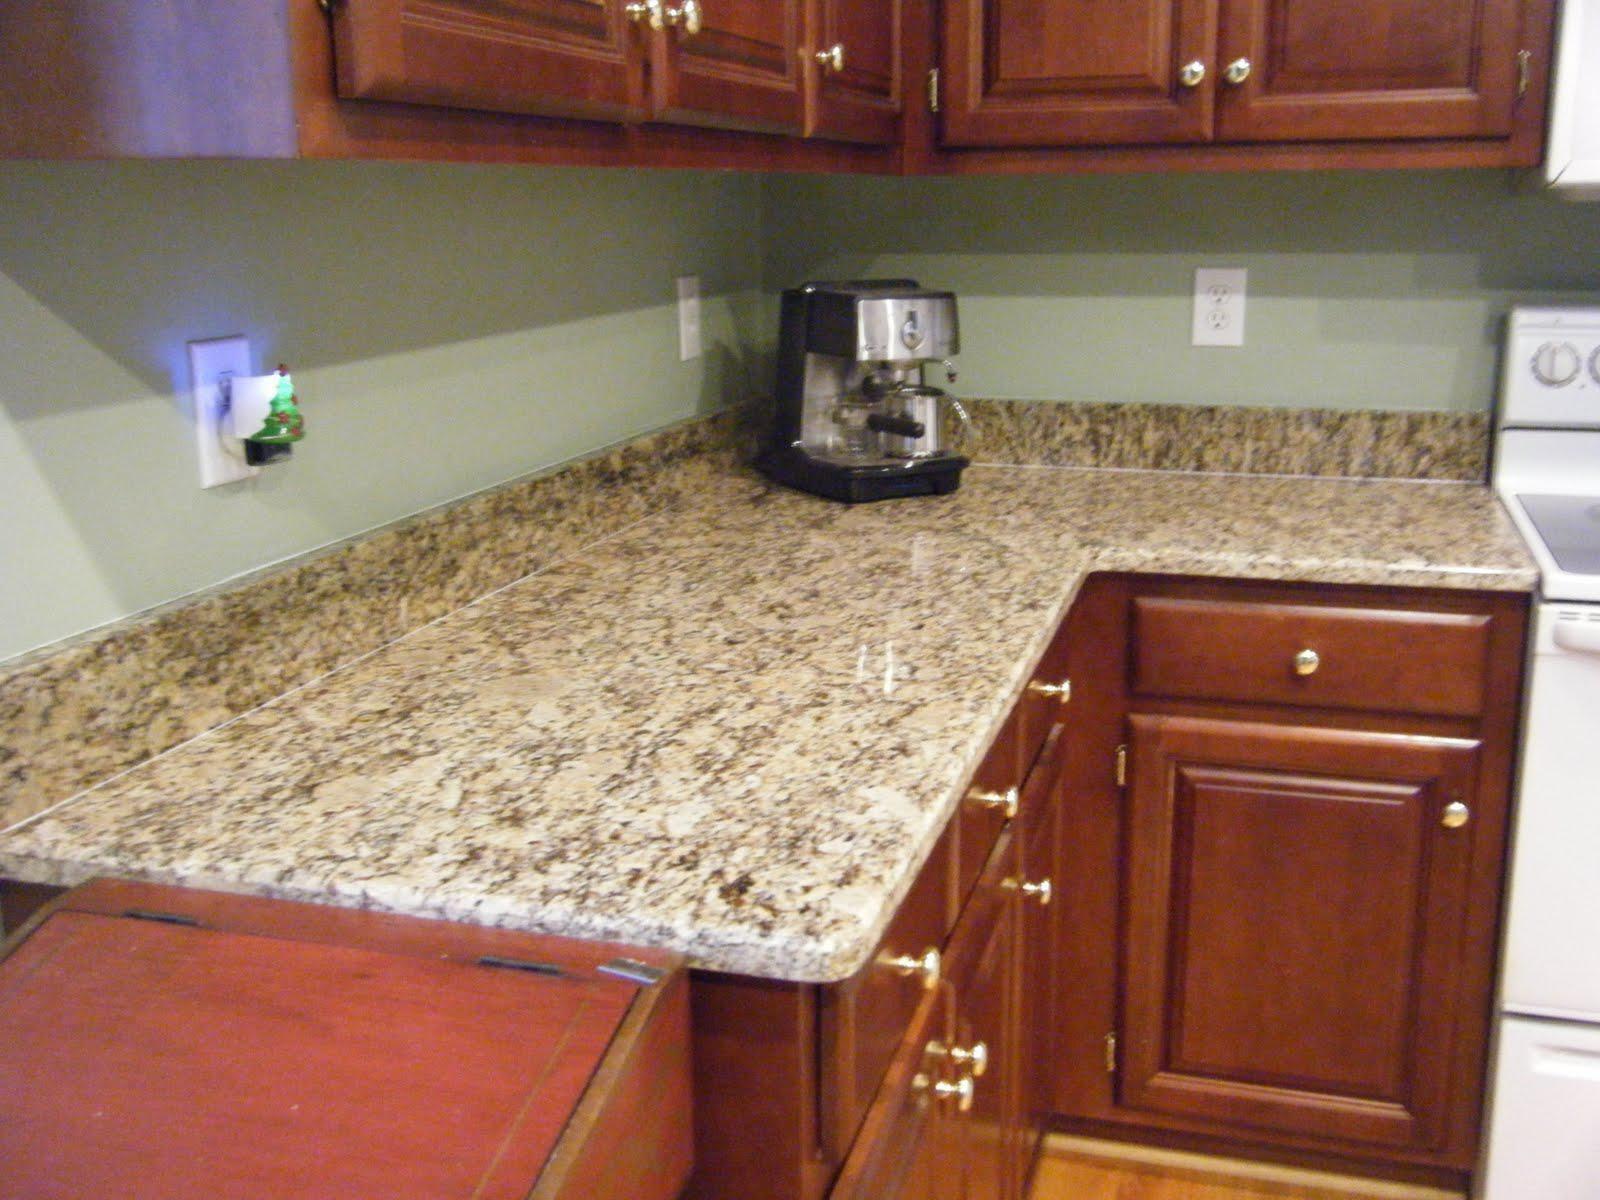 Braun Granit Kuche Arbeitsplatten Granit Kuche Arbeitsplatte Kuchen Granitarbeitsplatten